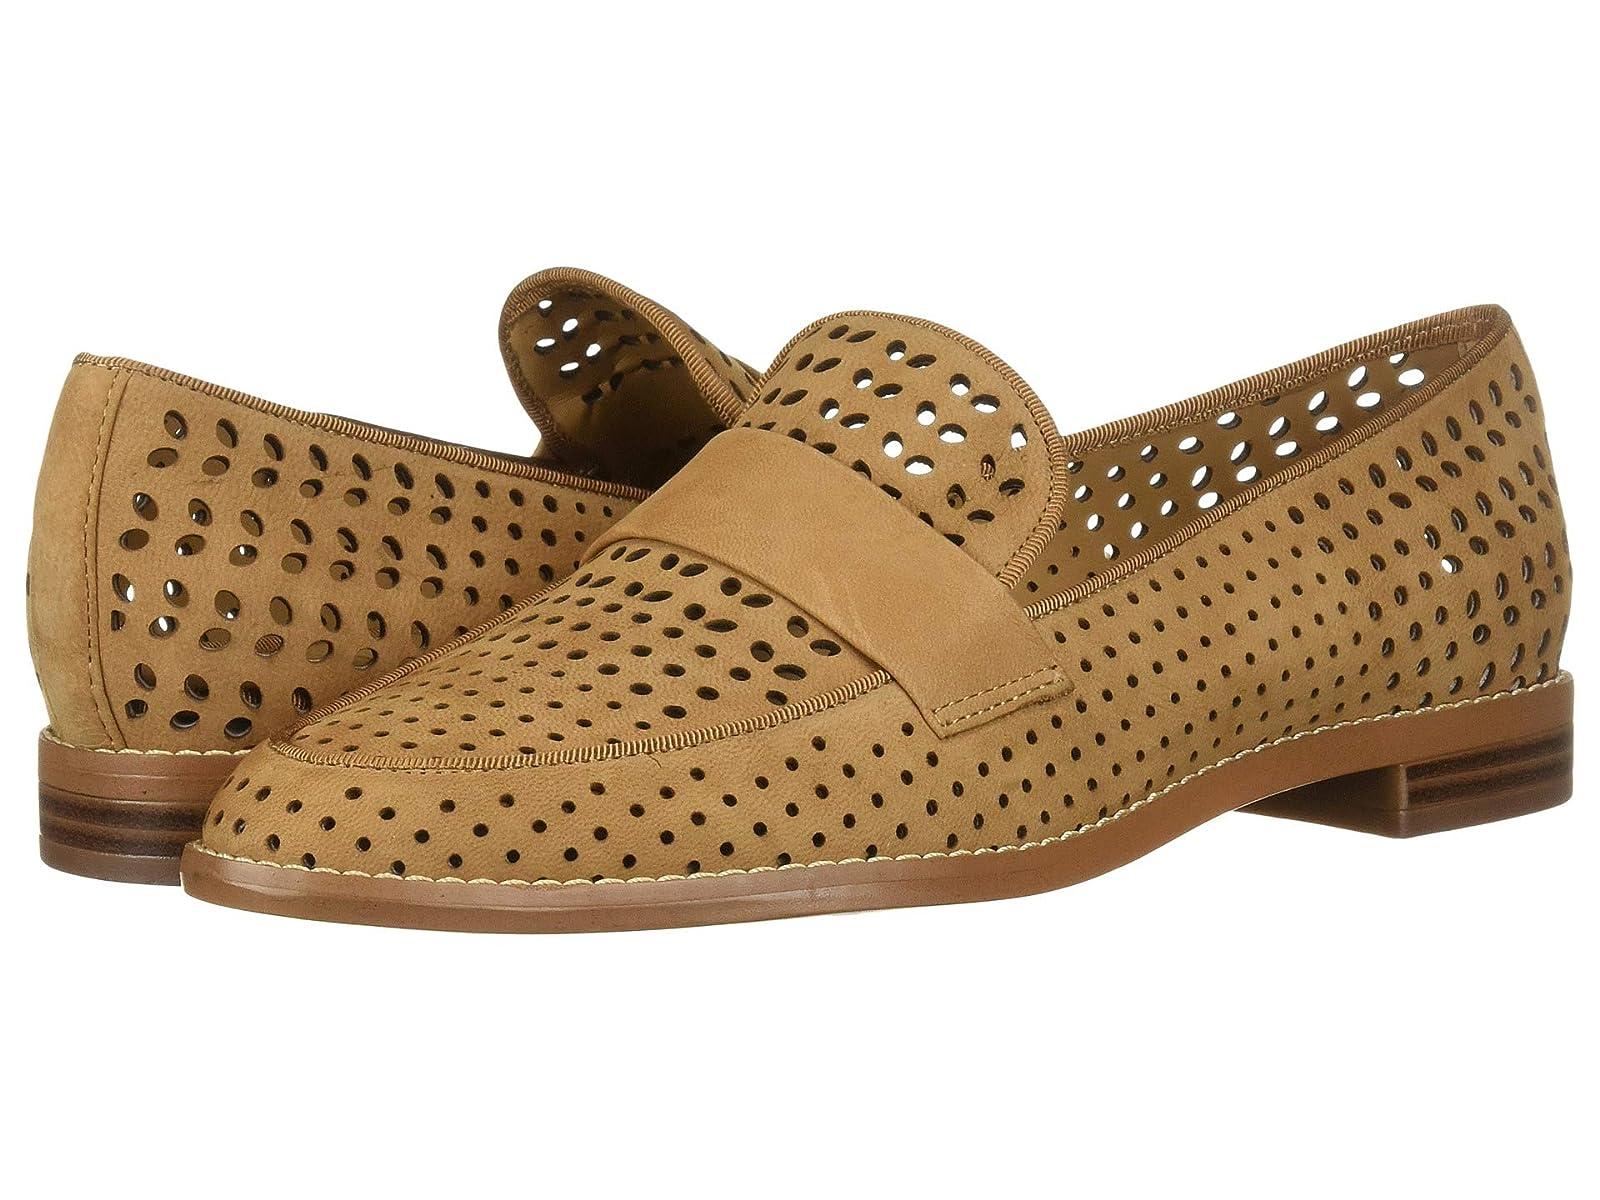 Franco Sarto Hudley 2Atmospheric grades have affordable shoes